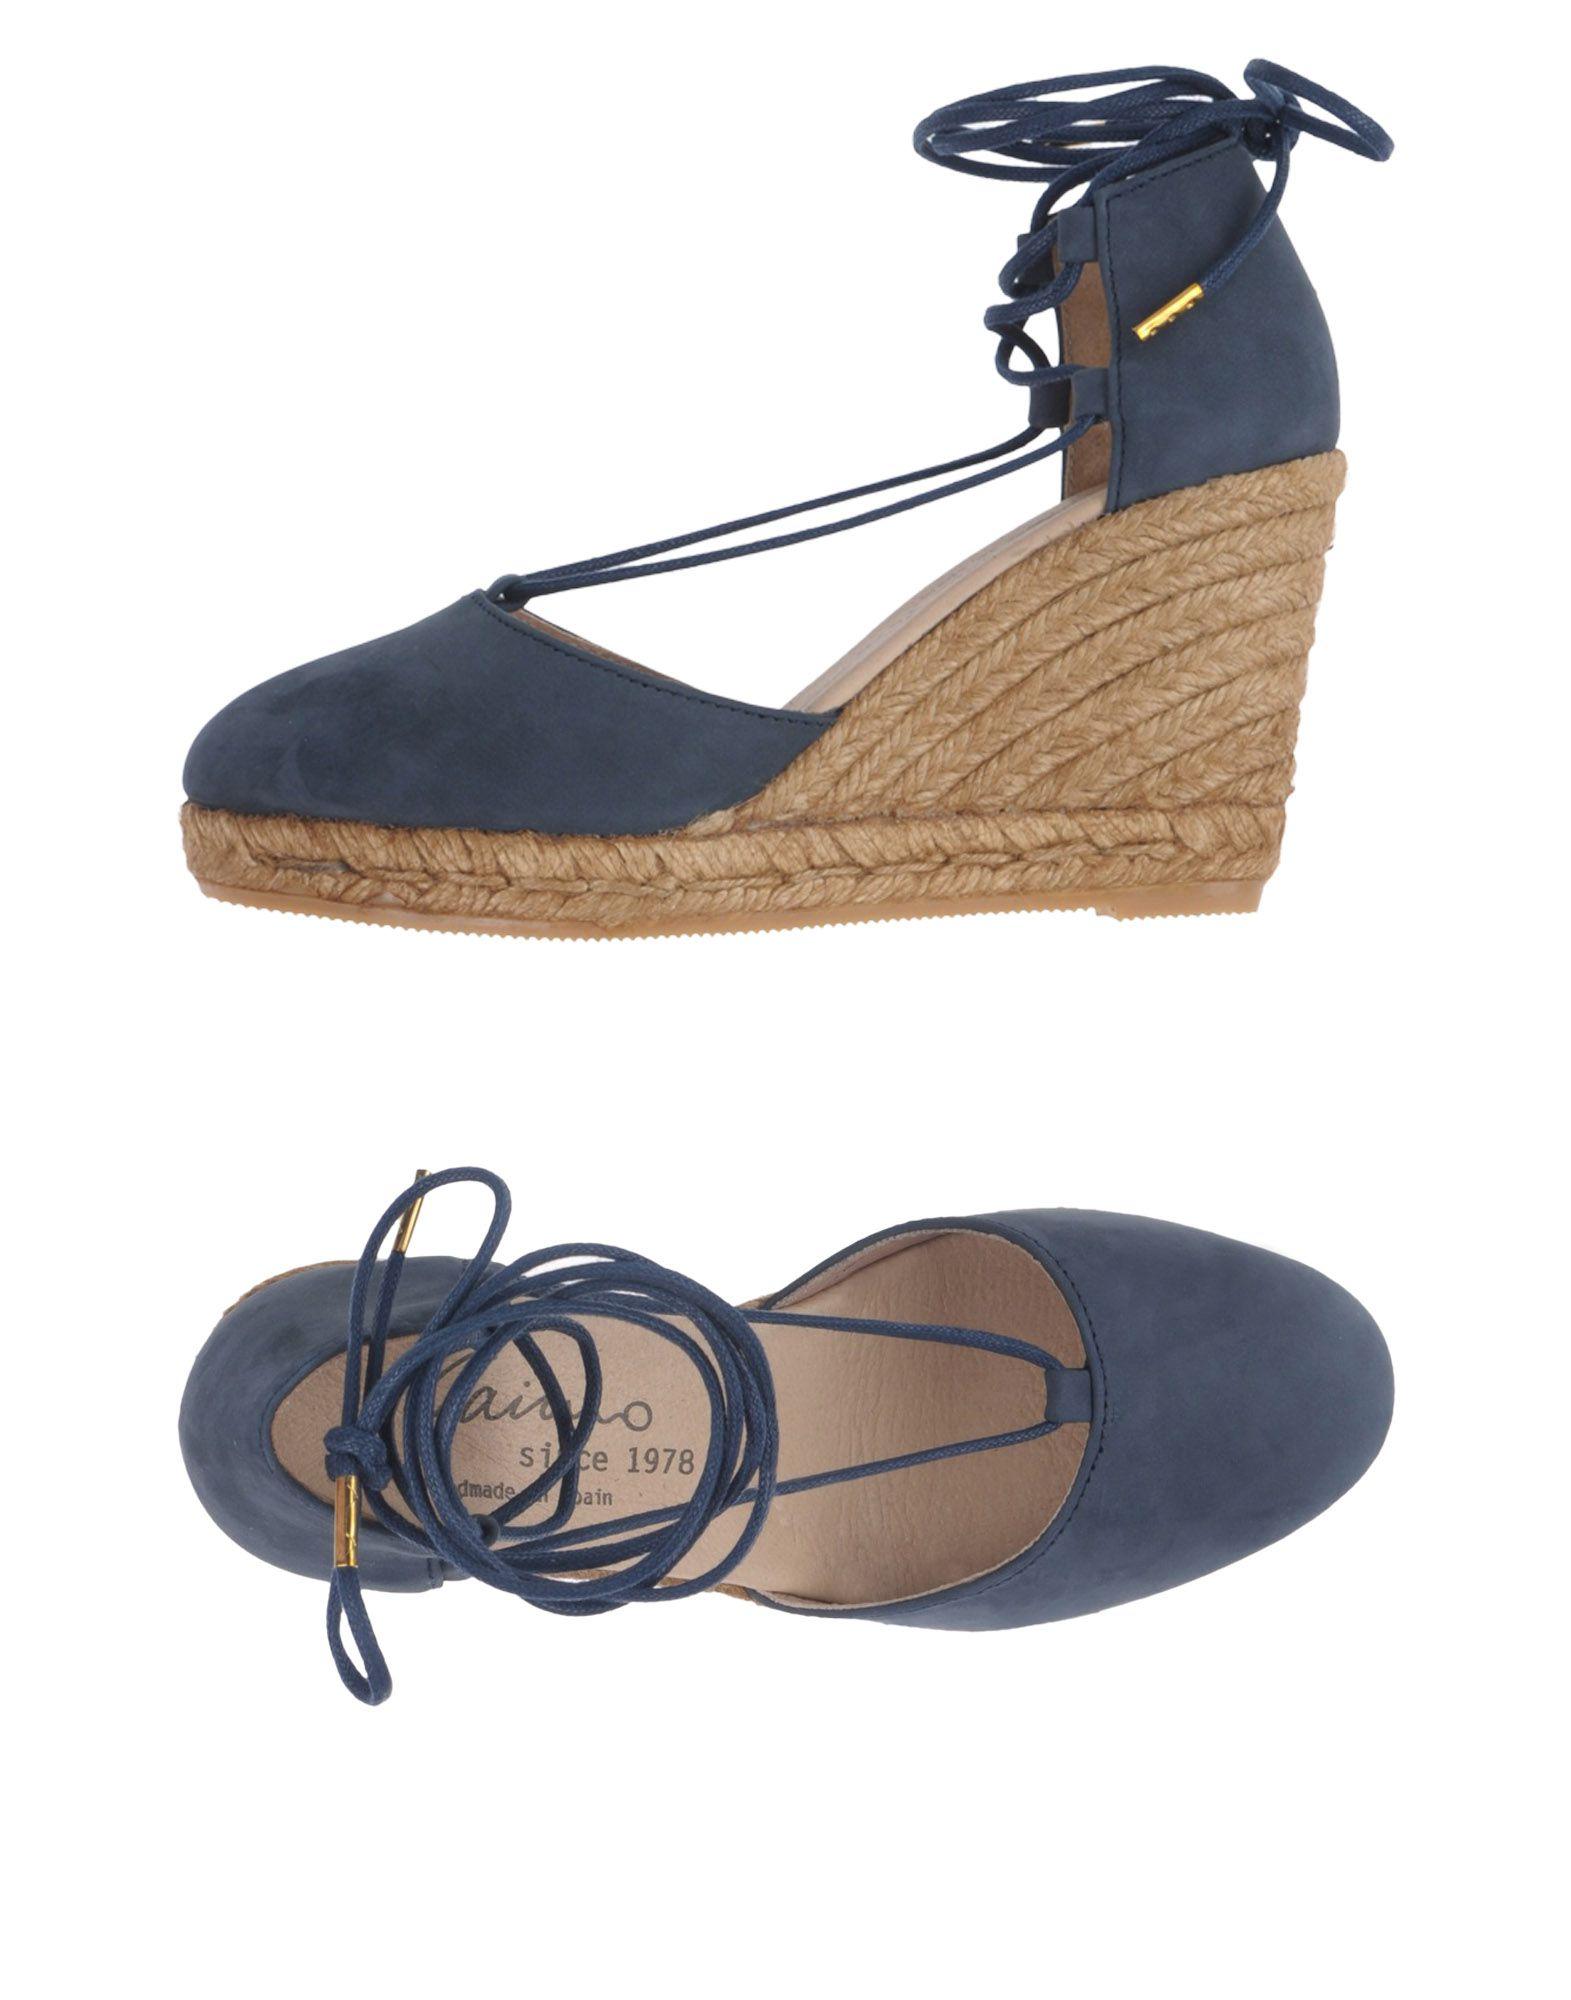 Gaimo Espadrilles Damen  11380834LO Gute Qualität beliebte Schuhe